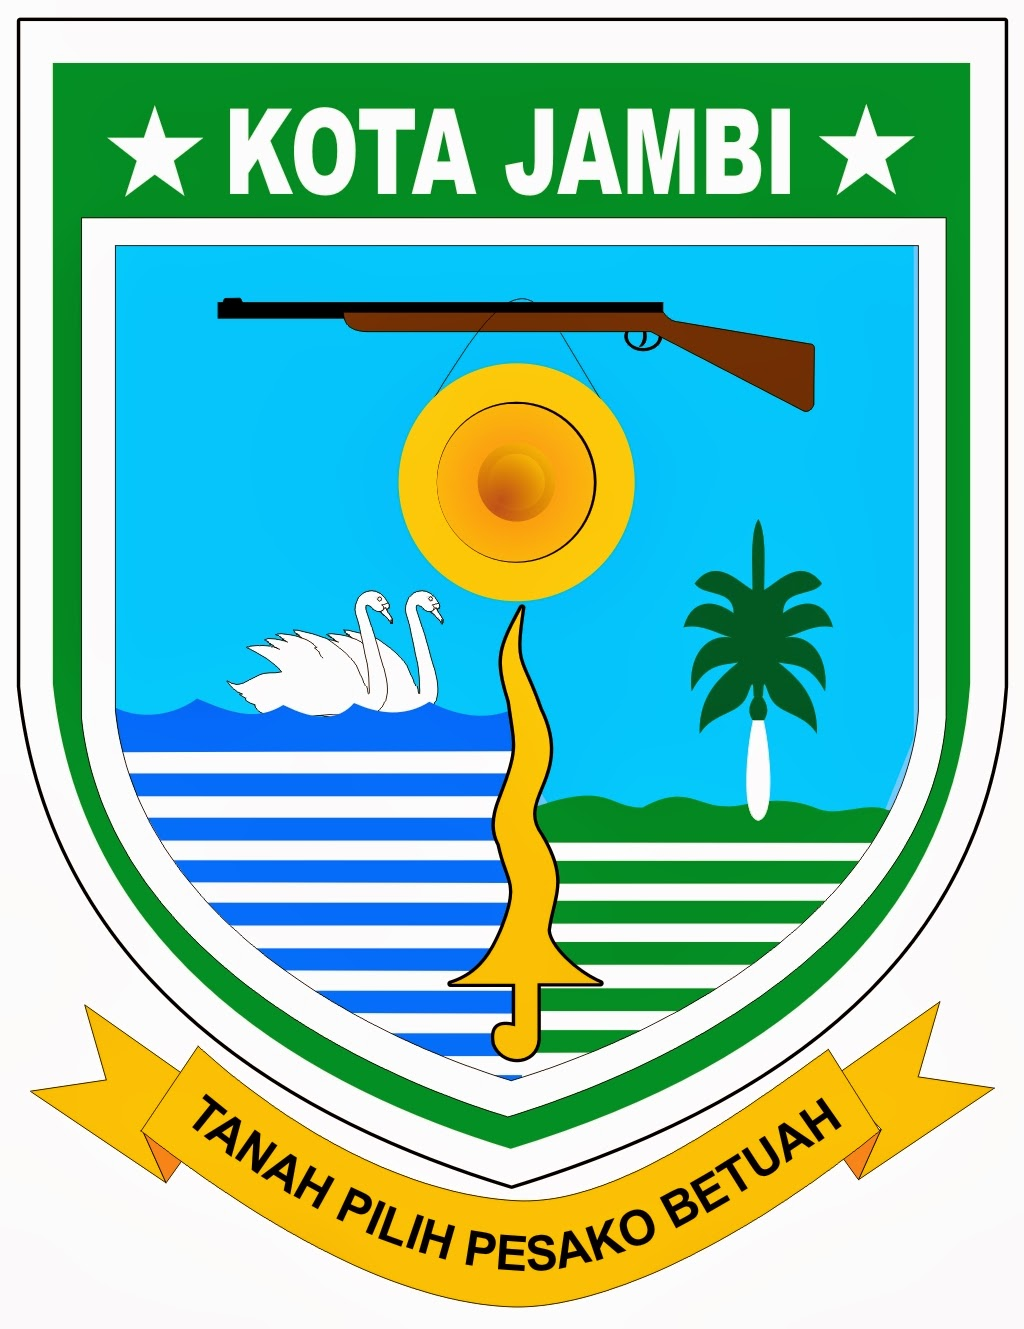 Pbb terbaru logo